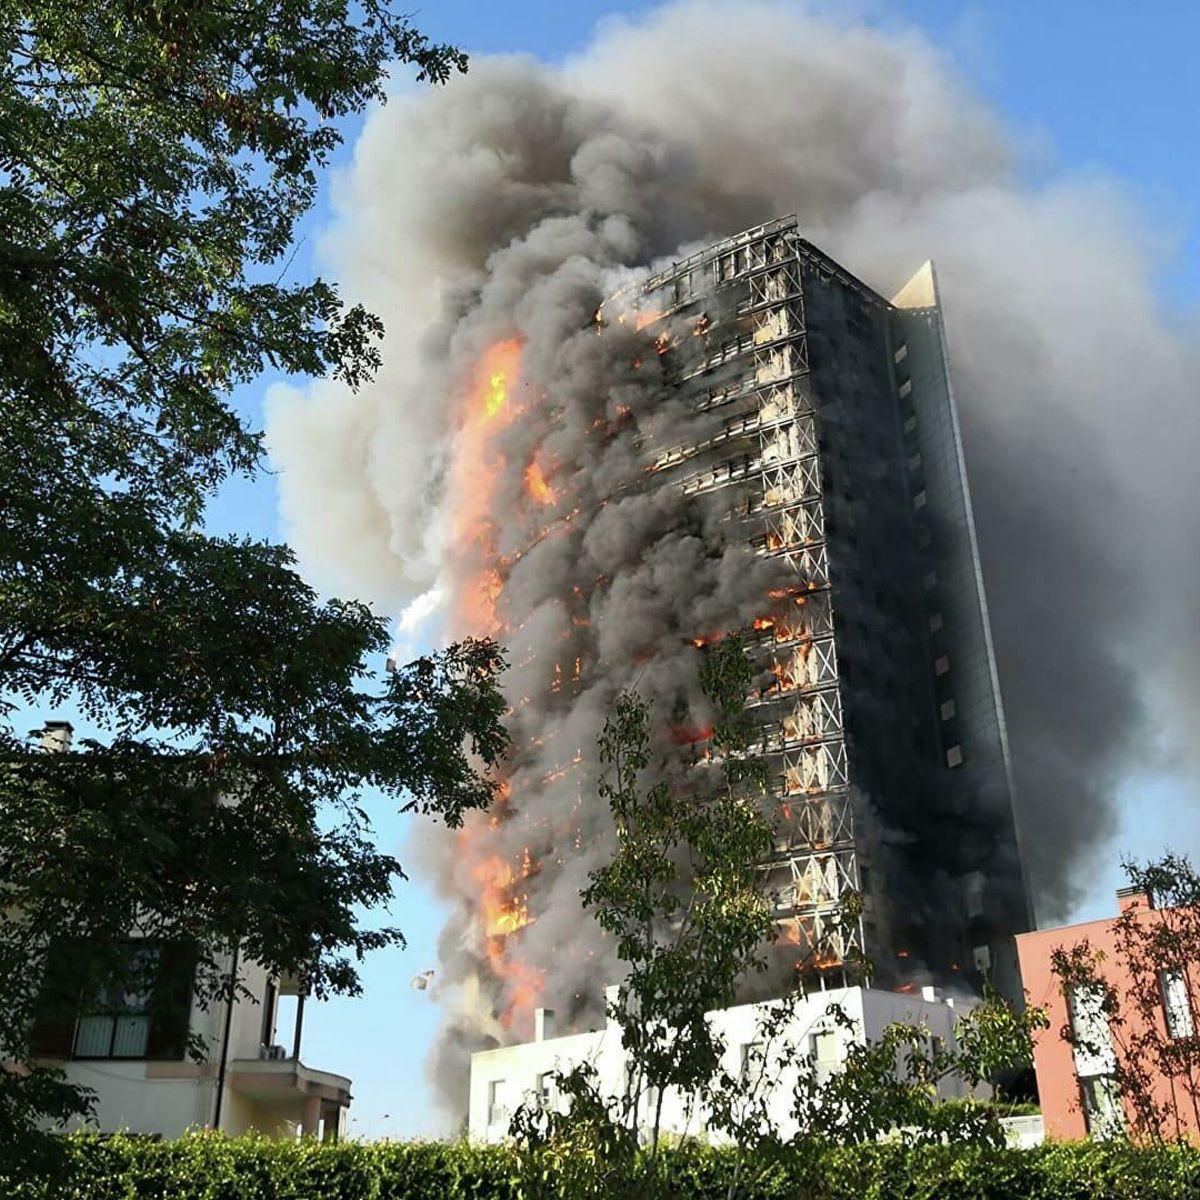 Morgan Gesto Inquilini Incendio Grattacielo Milano